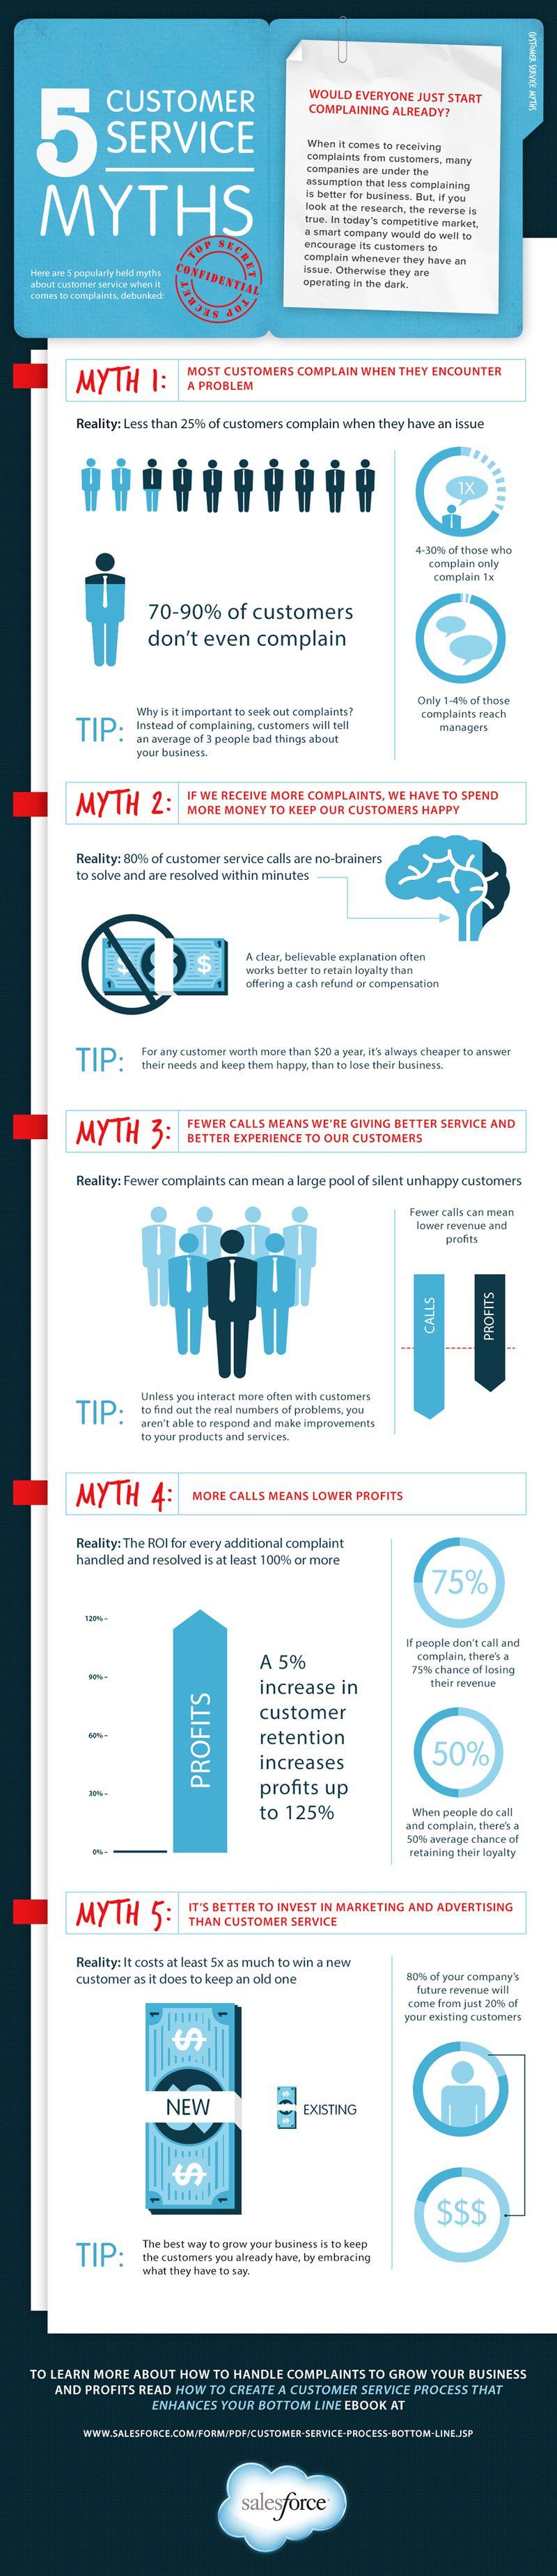 Customer Service Myths